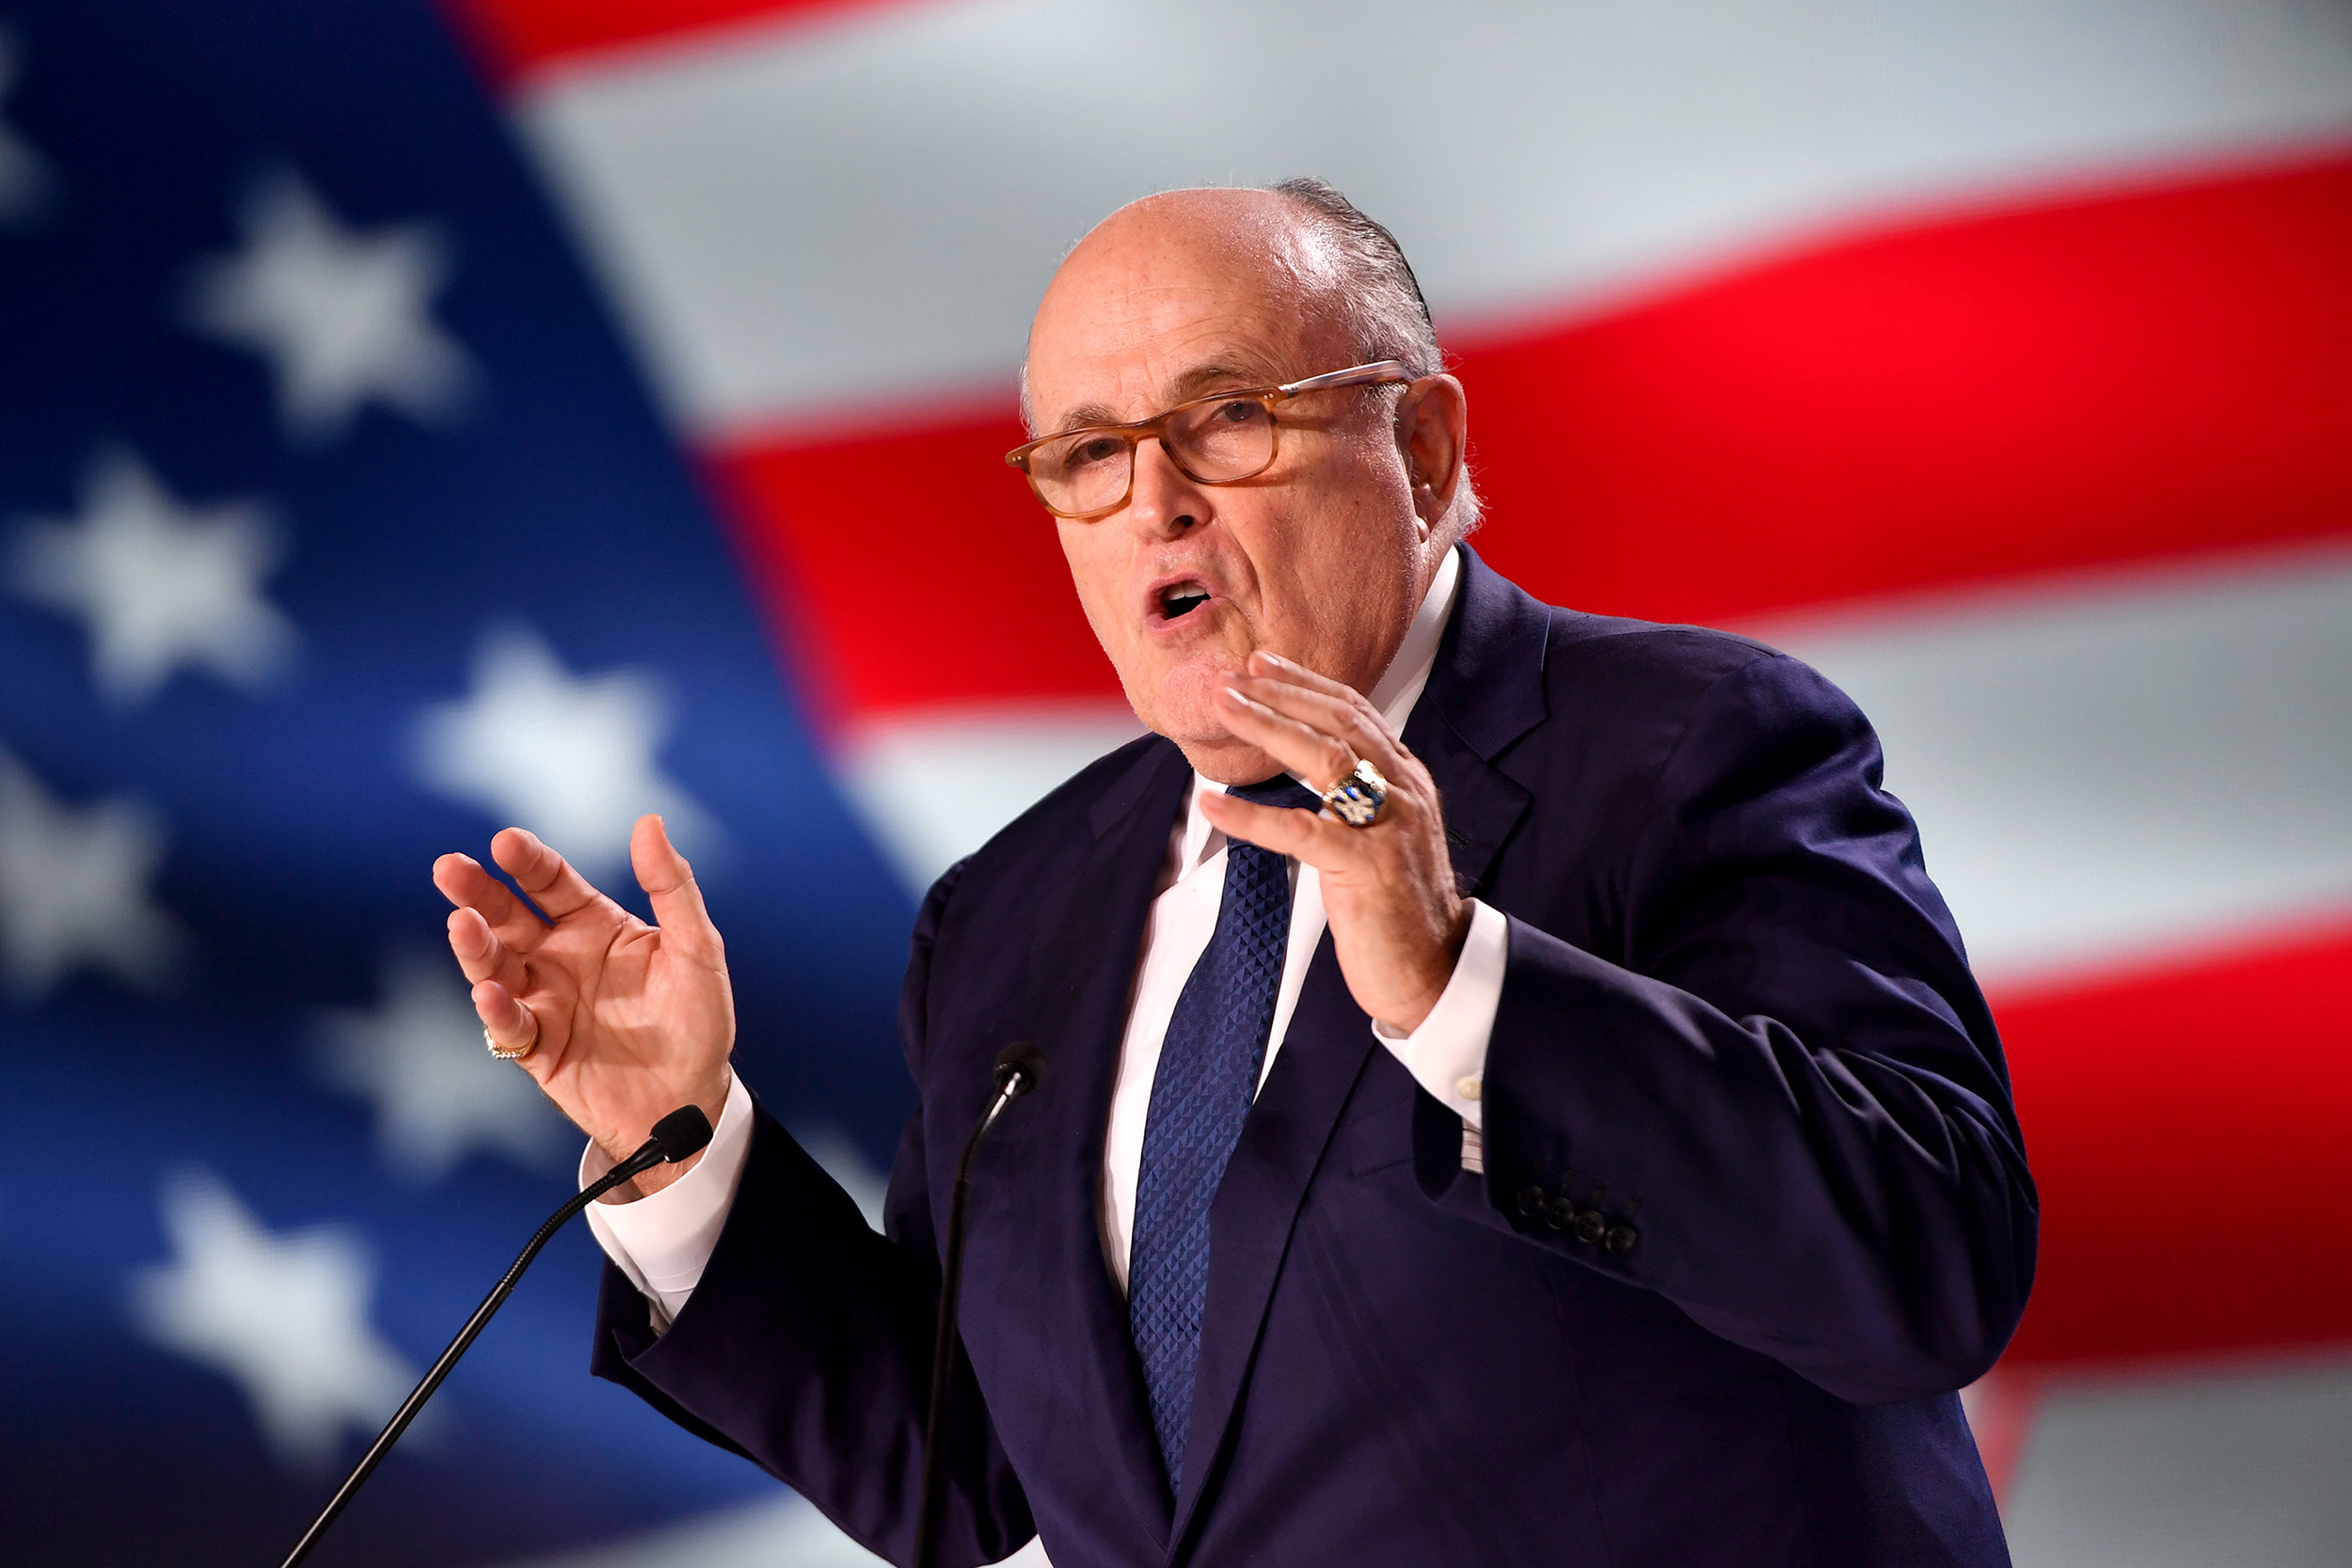 nbcnews.com - Giuliani won't comply with congressional subpoena